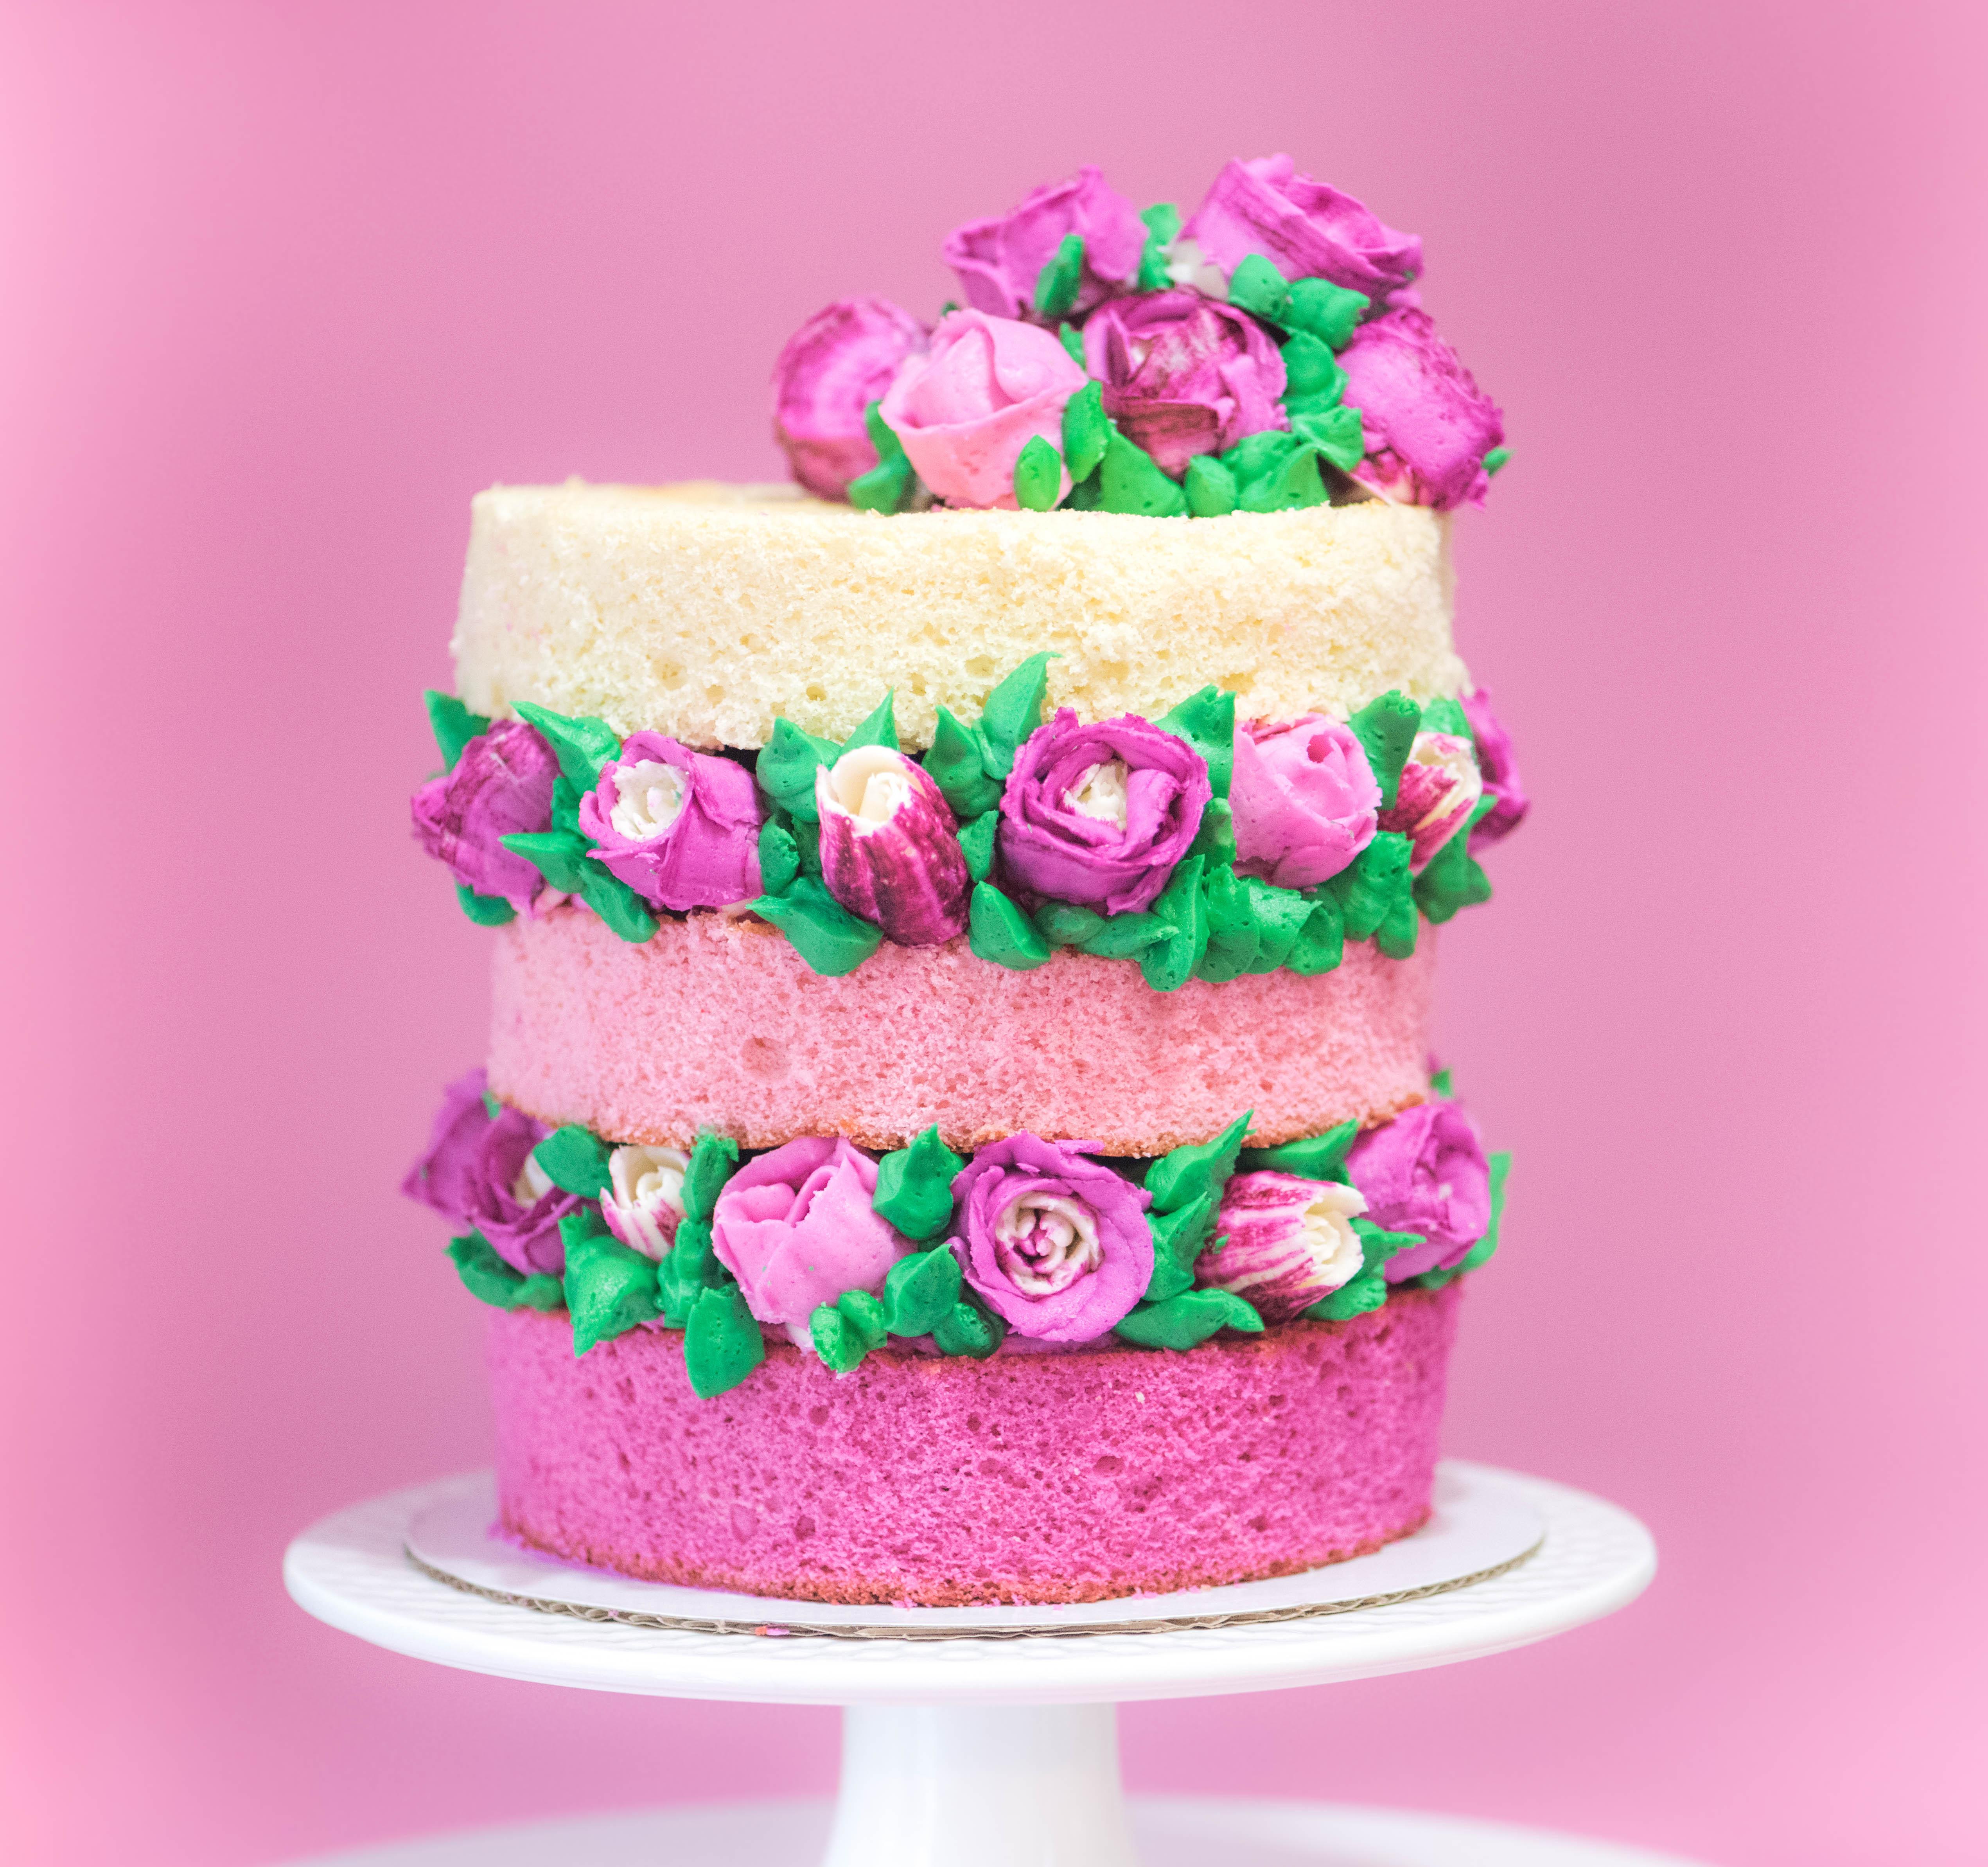 10 Amazing Valentines Cake Ideas